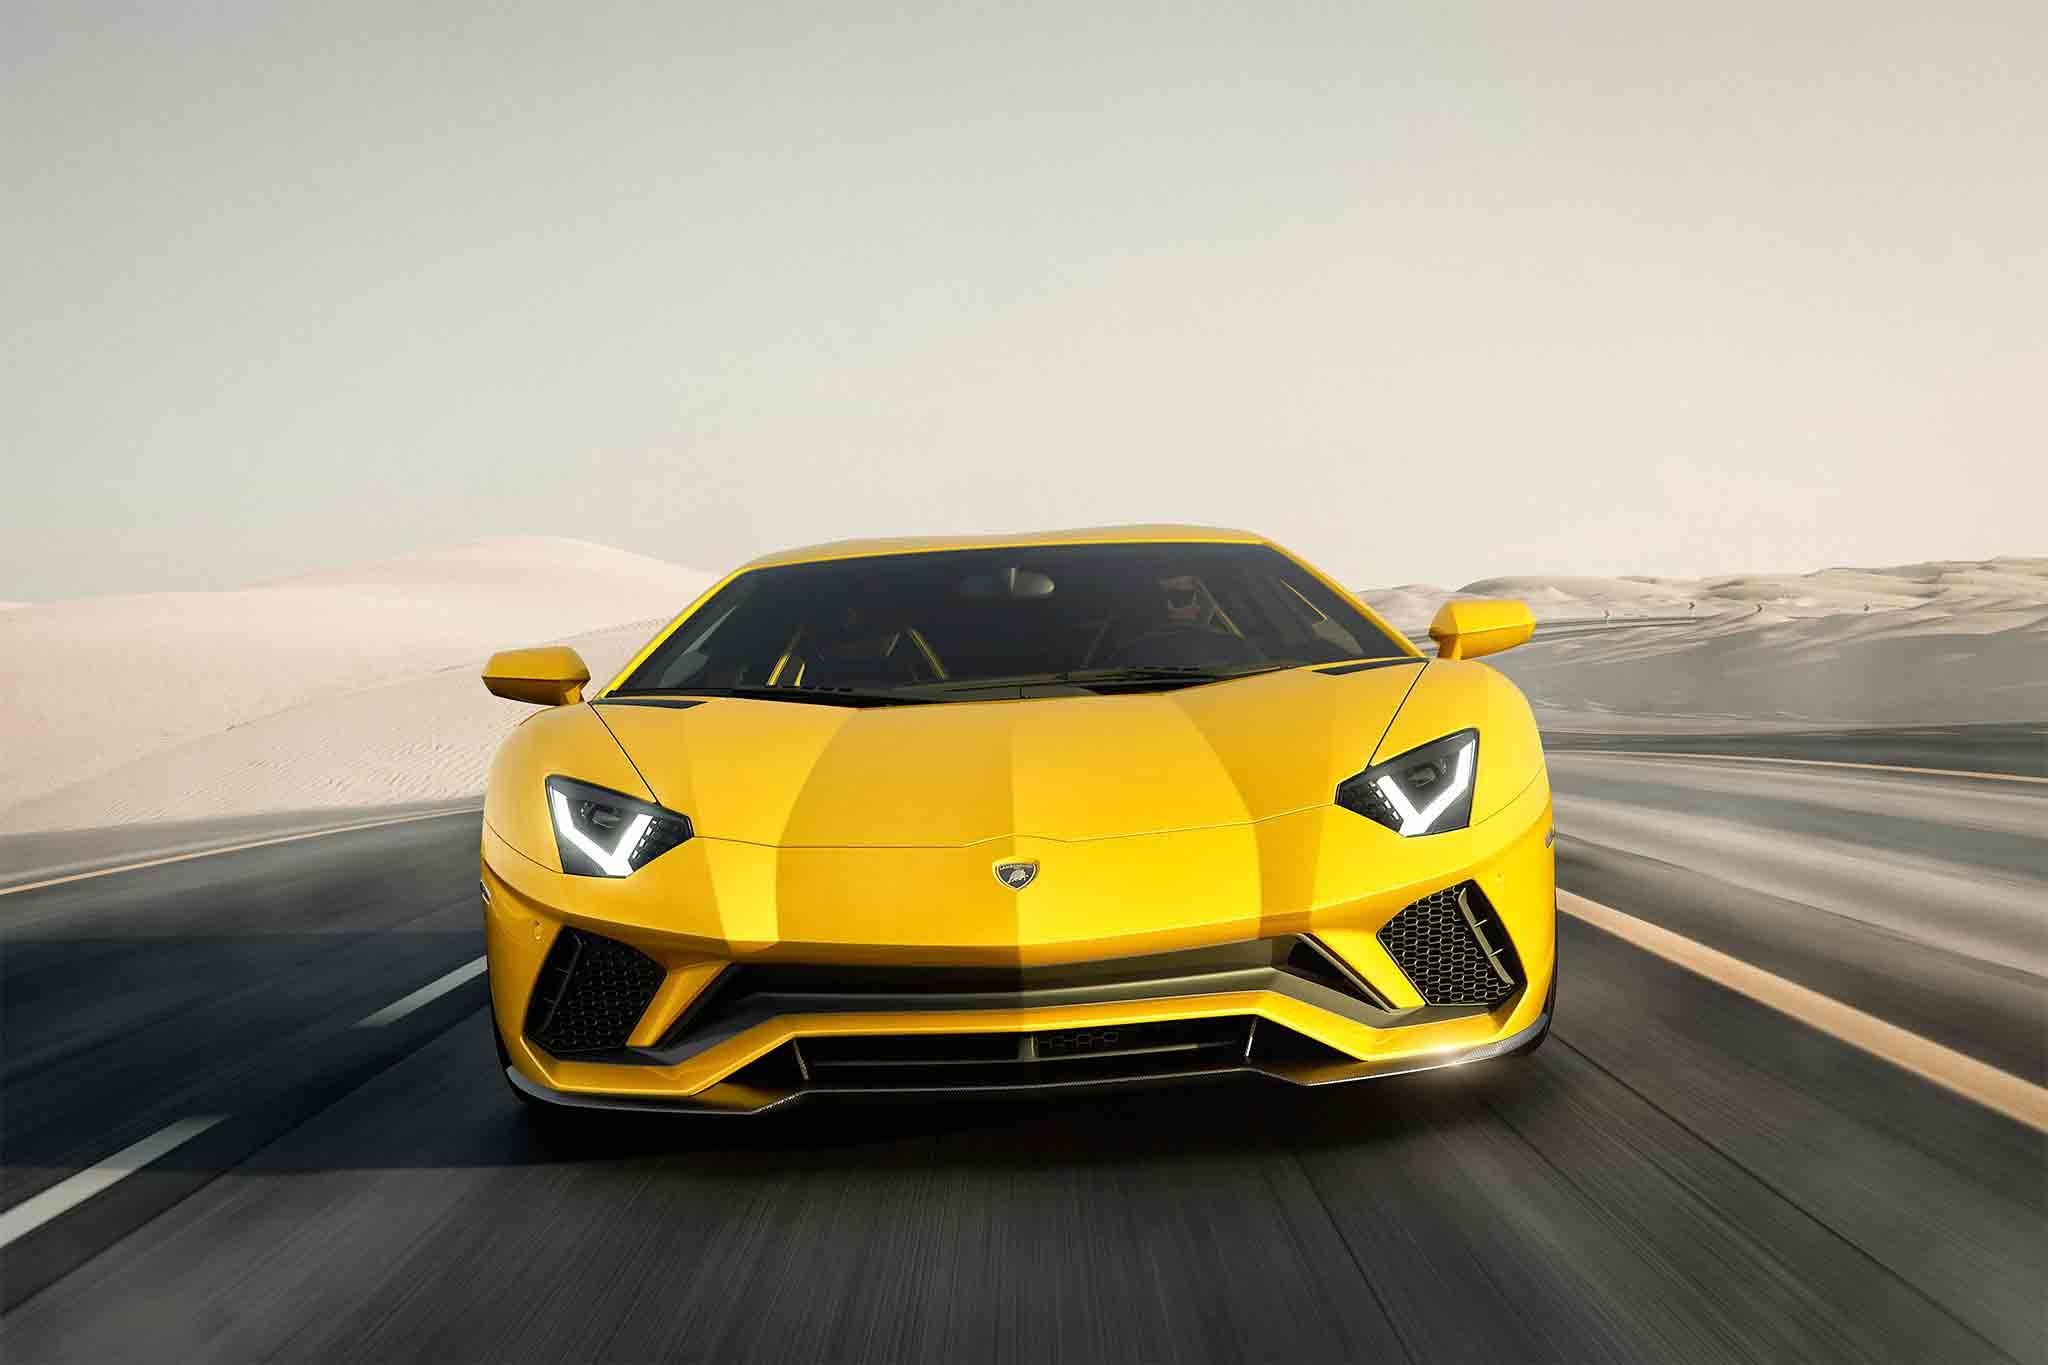 Lamborghini Aventador S Front View In Motion 03 1